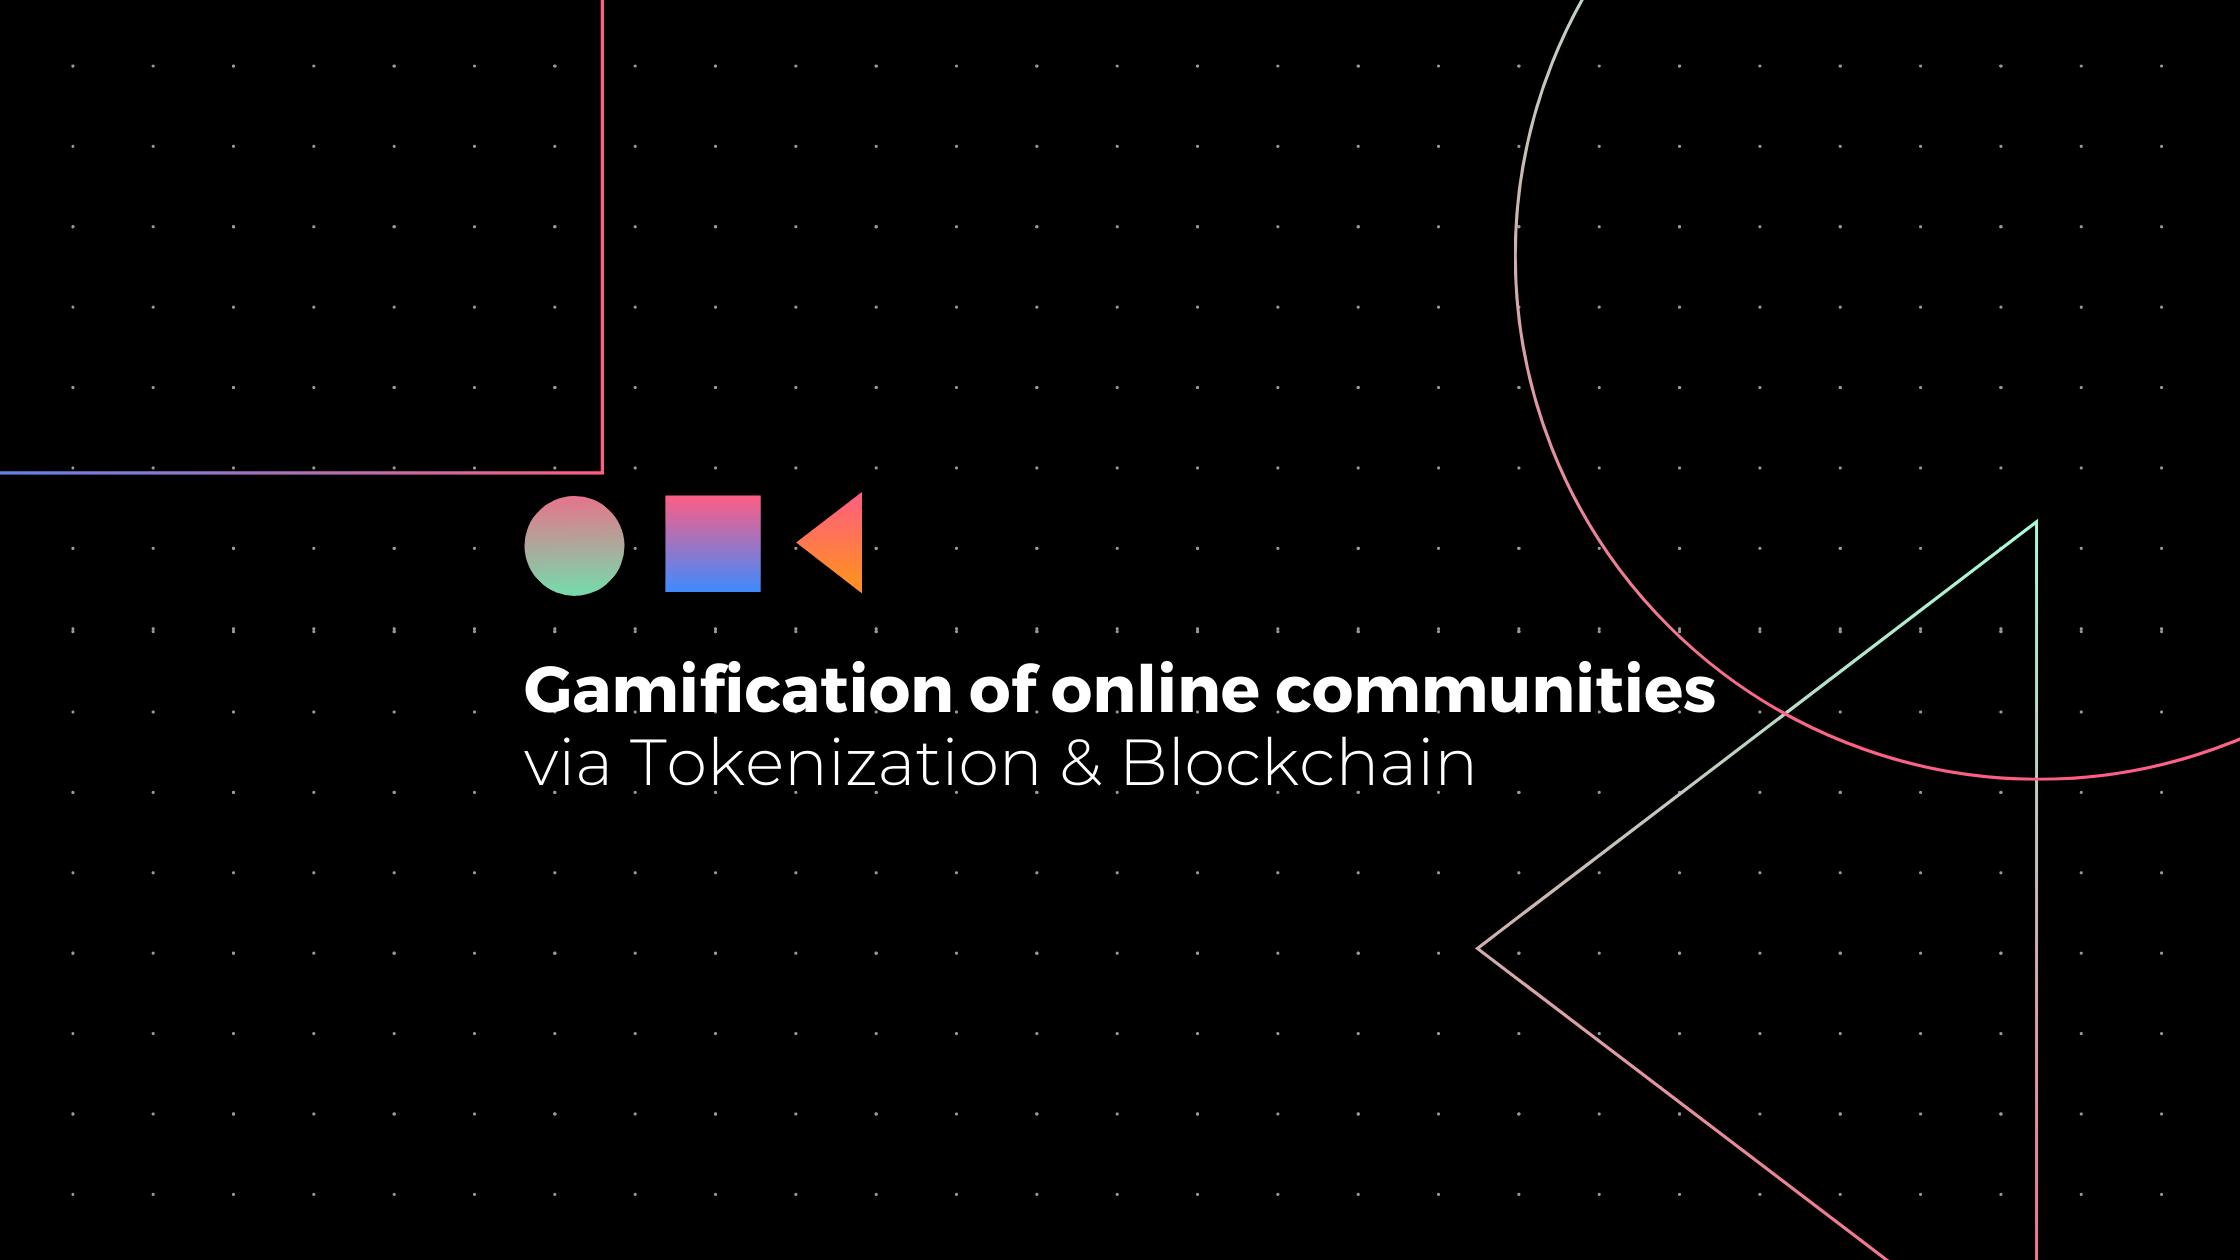 Gamification-via-tokenization